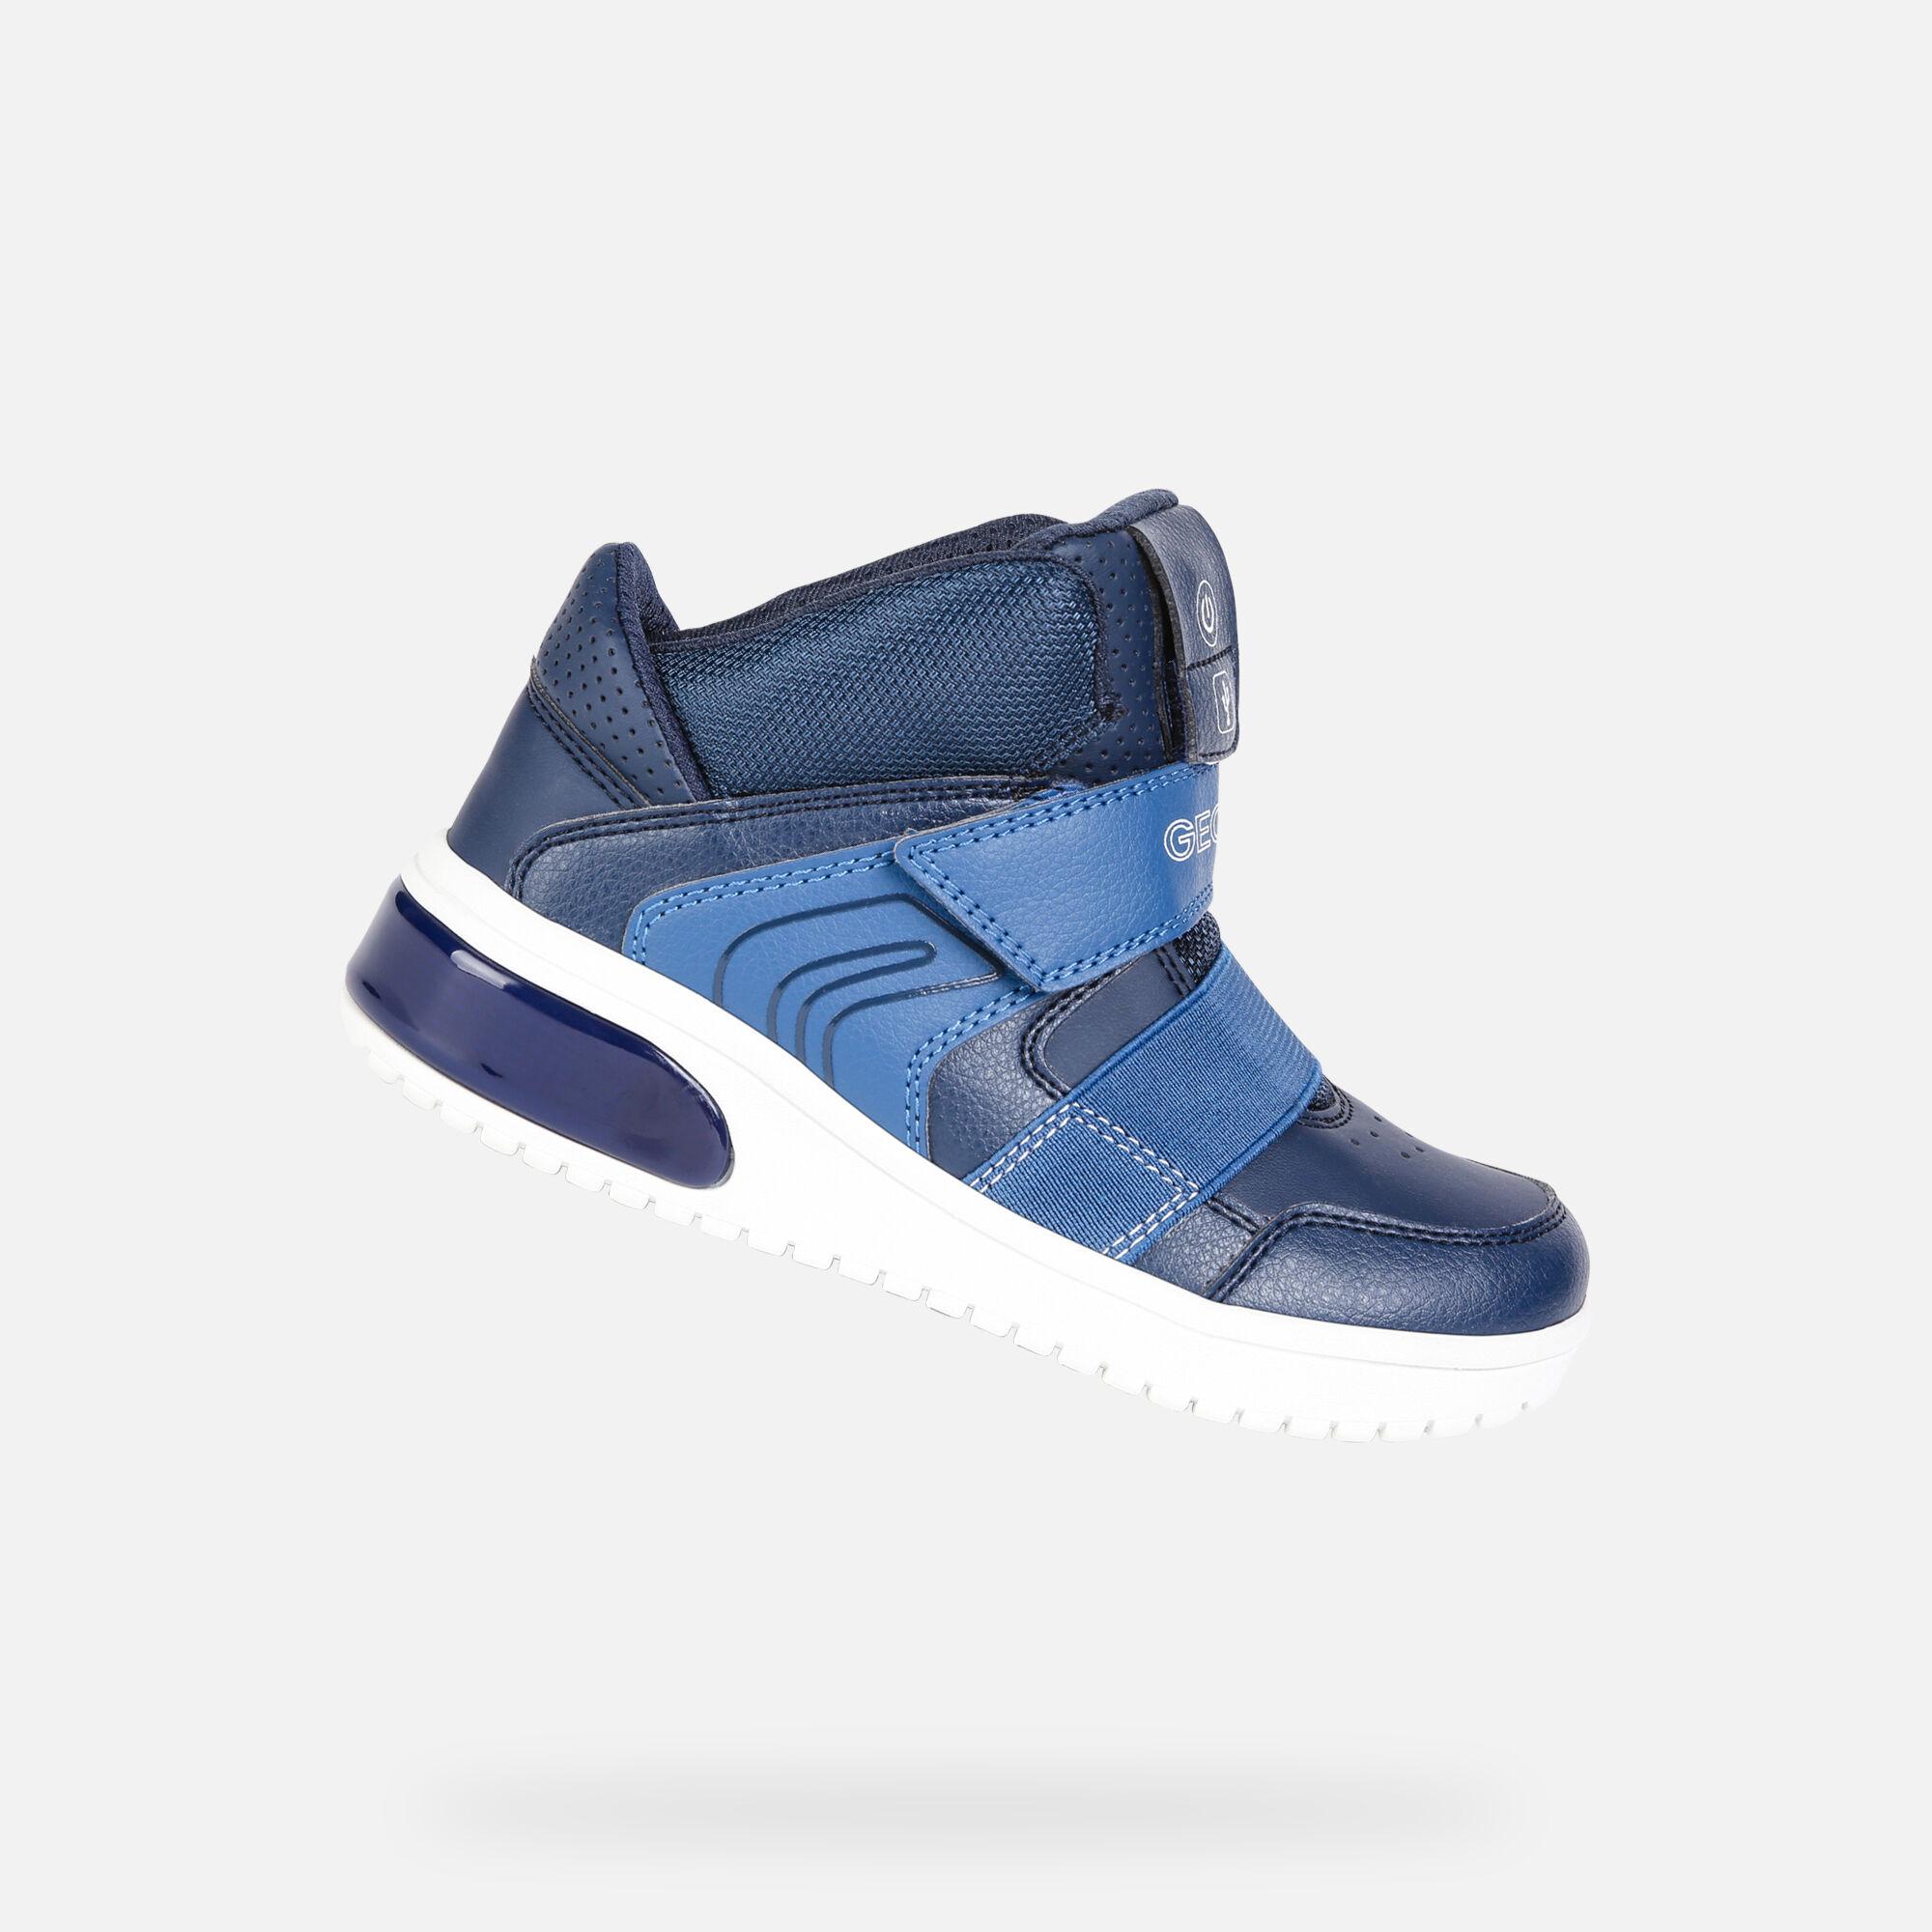 Geox XLED Junior Boy: Blue Sneakers | Geox ® FW 1920